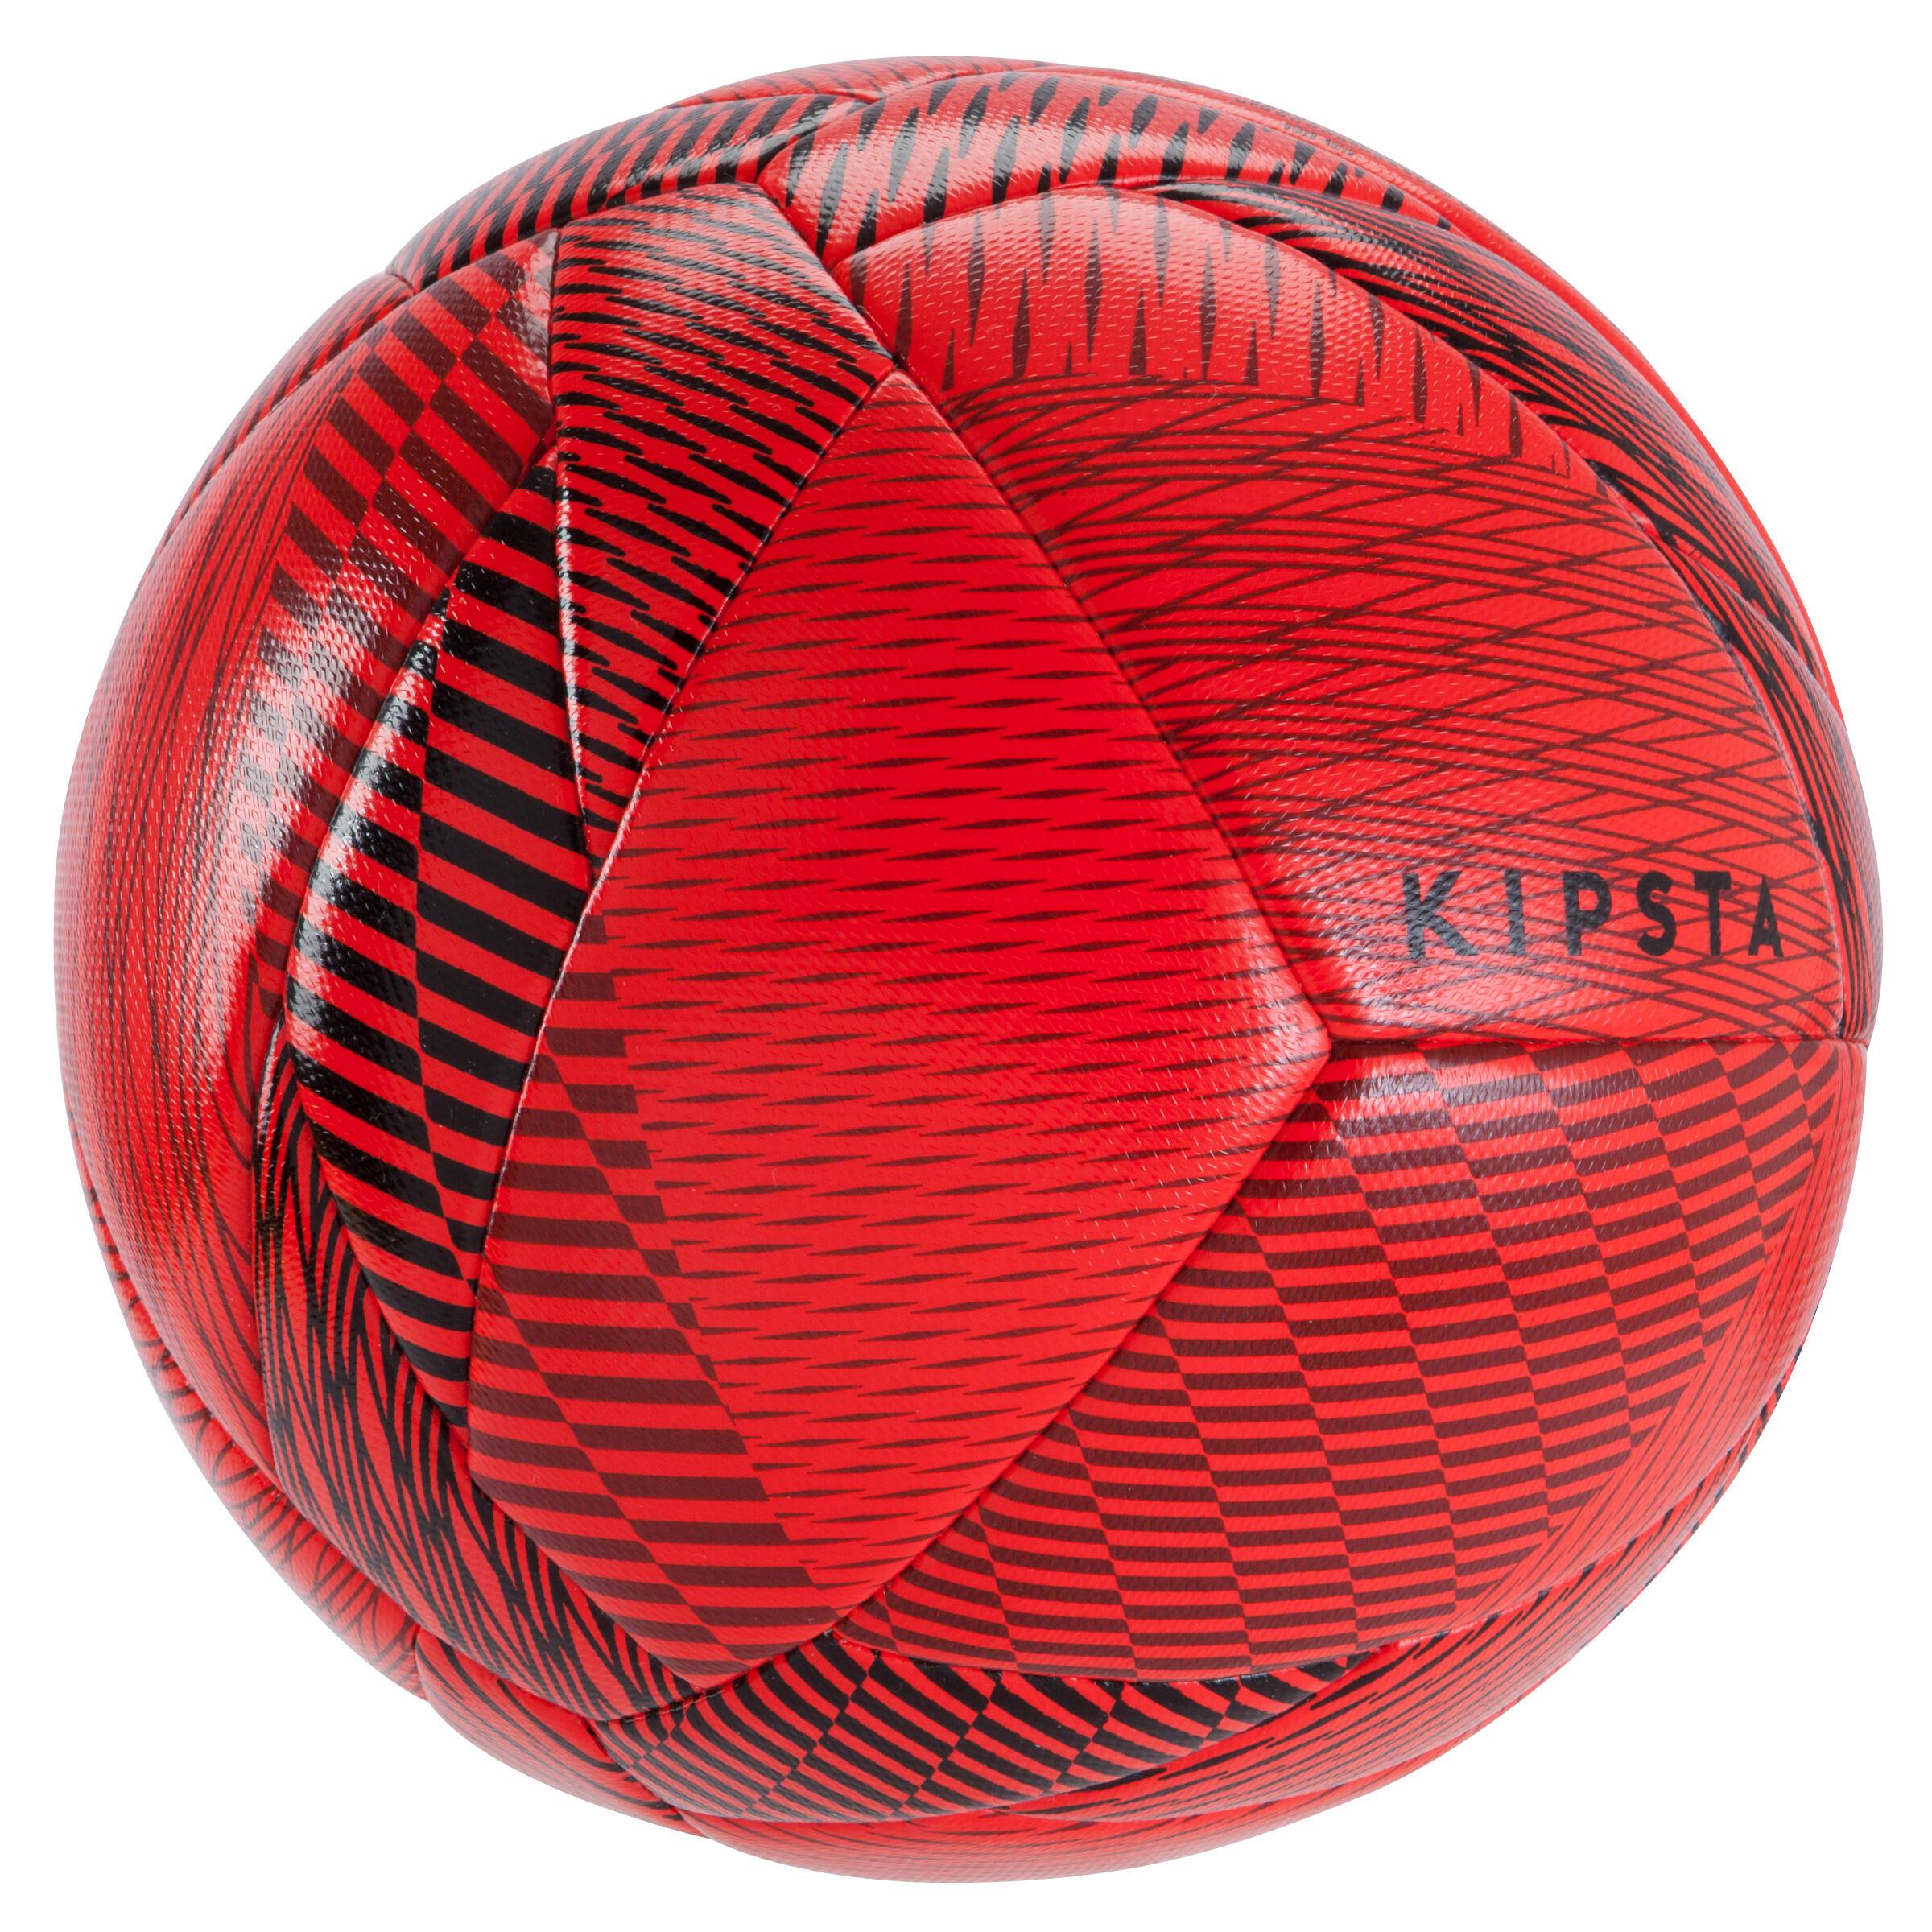 Futsal 100 Hybrid Football Size 63cm - Red